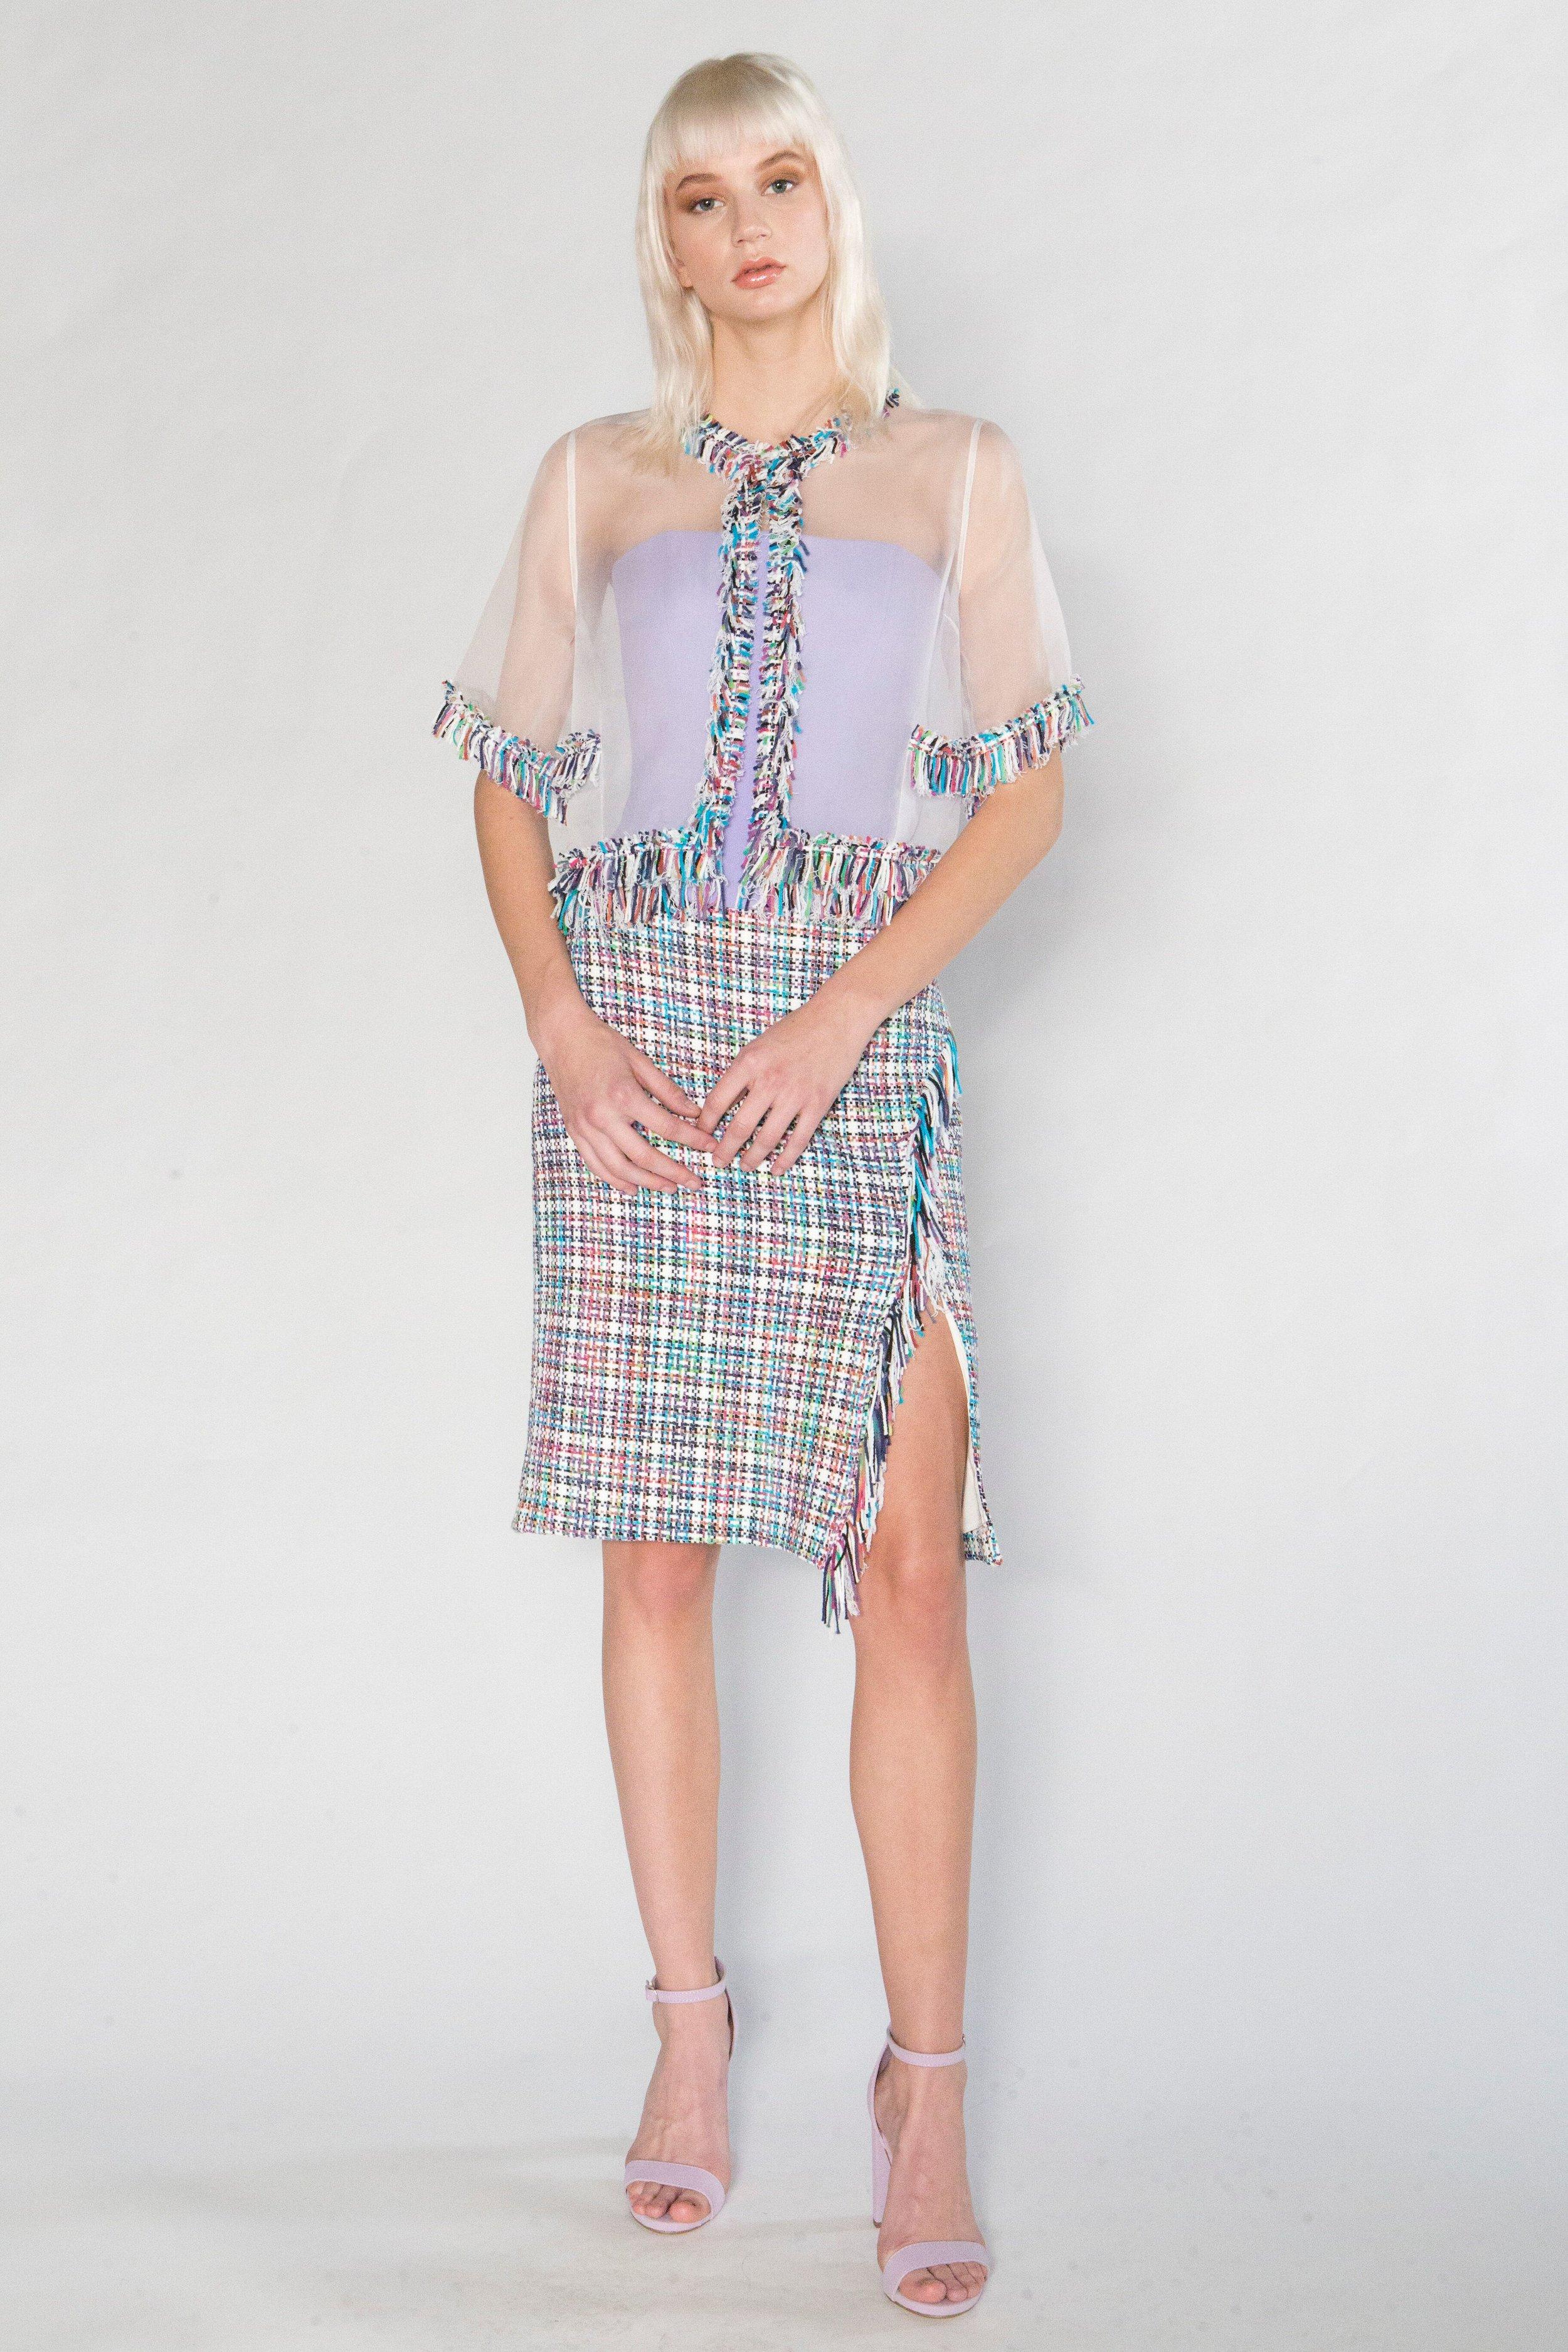 Organza Bolero w/Summer Tweed Trim, Solid Bustier Top, and Summer Tweed Fringe Wrap Skirt